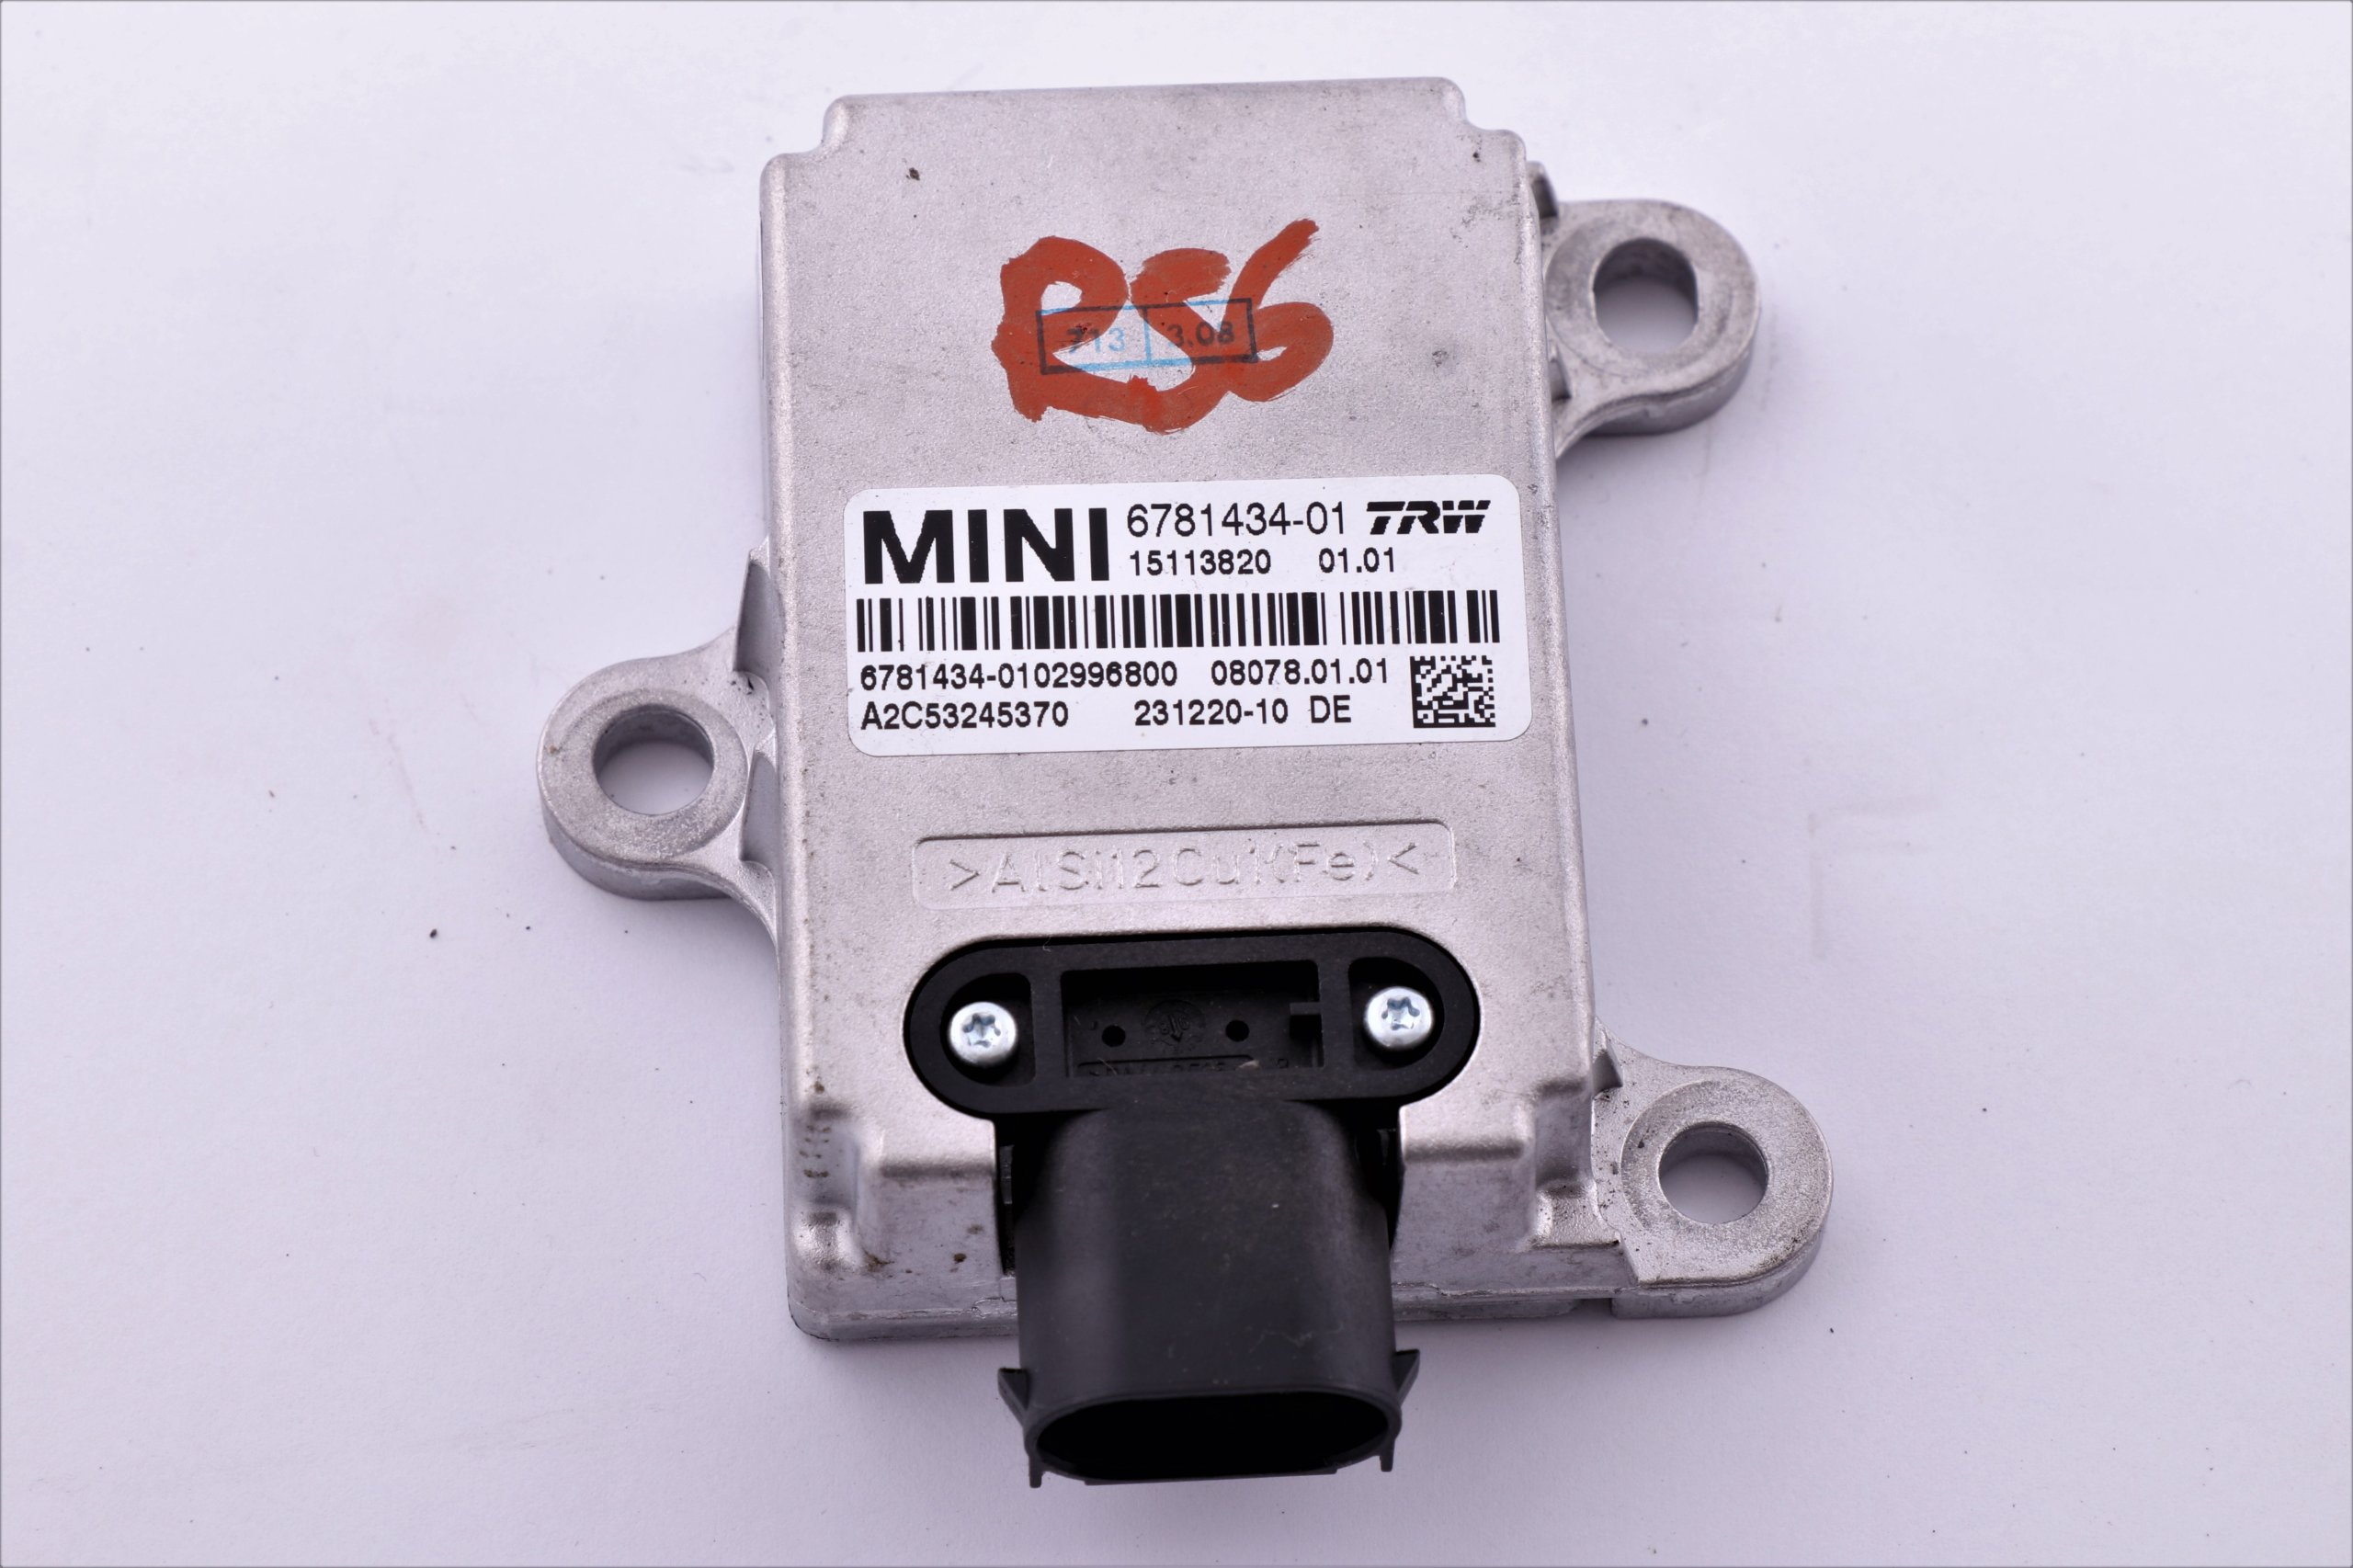 мини r55 r56 r57 модуль сенсор датчик оборотов dsc